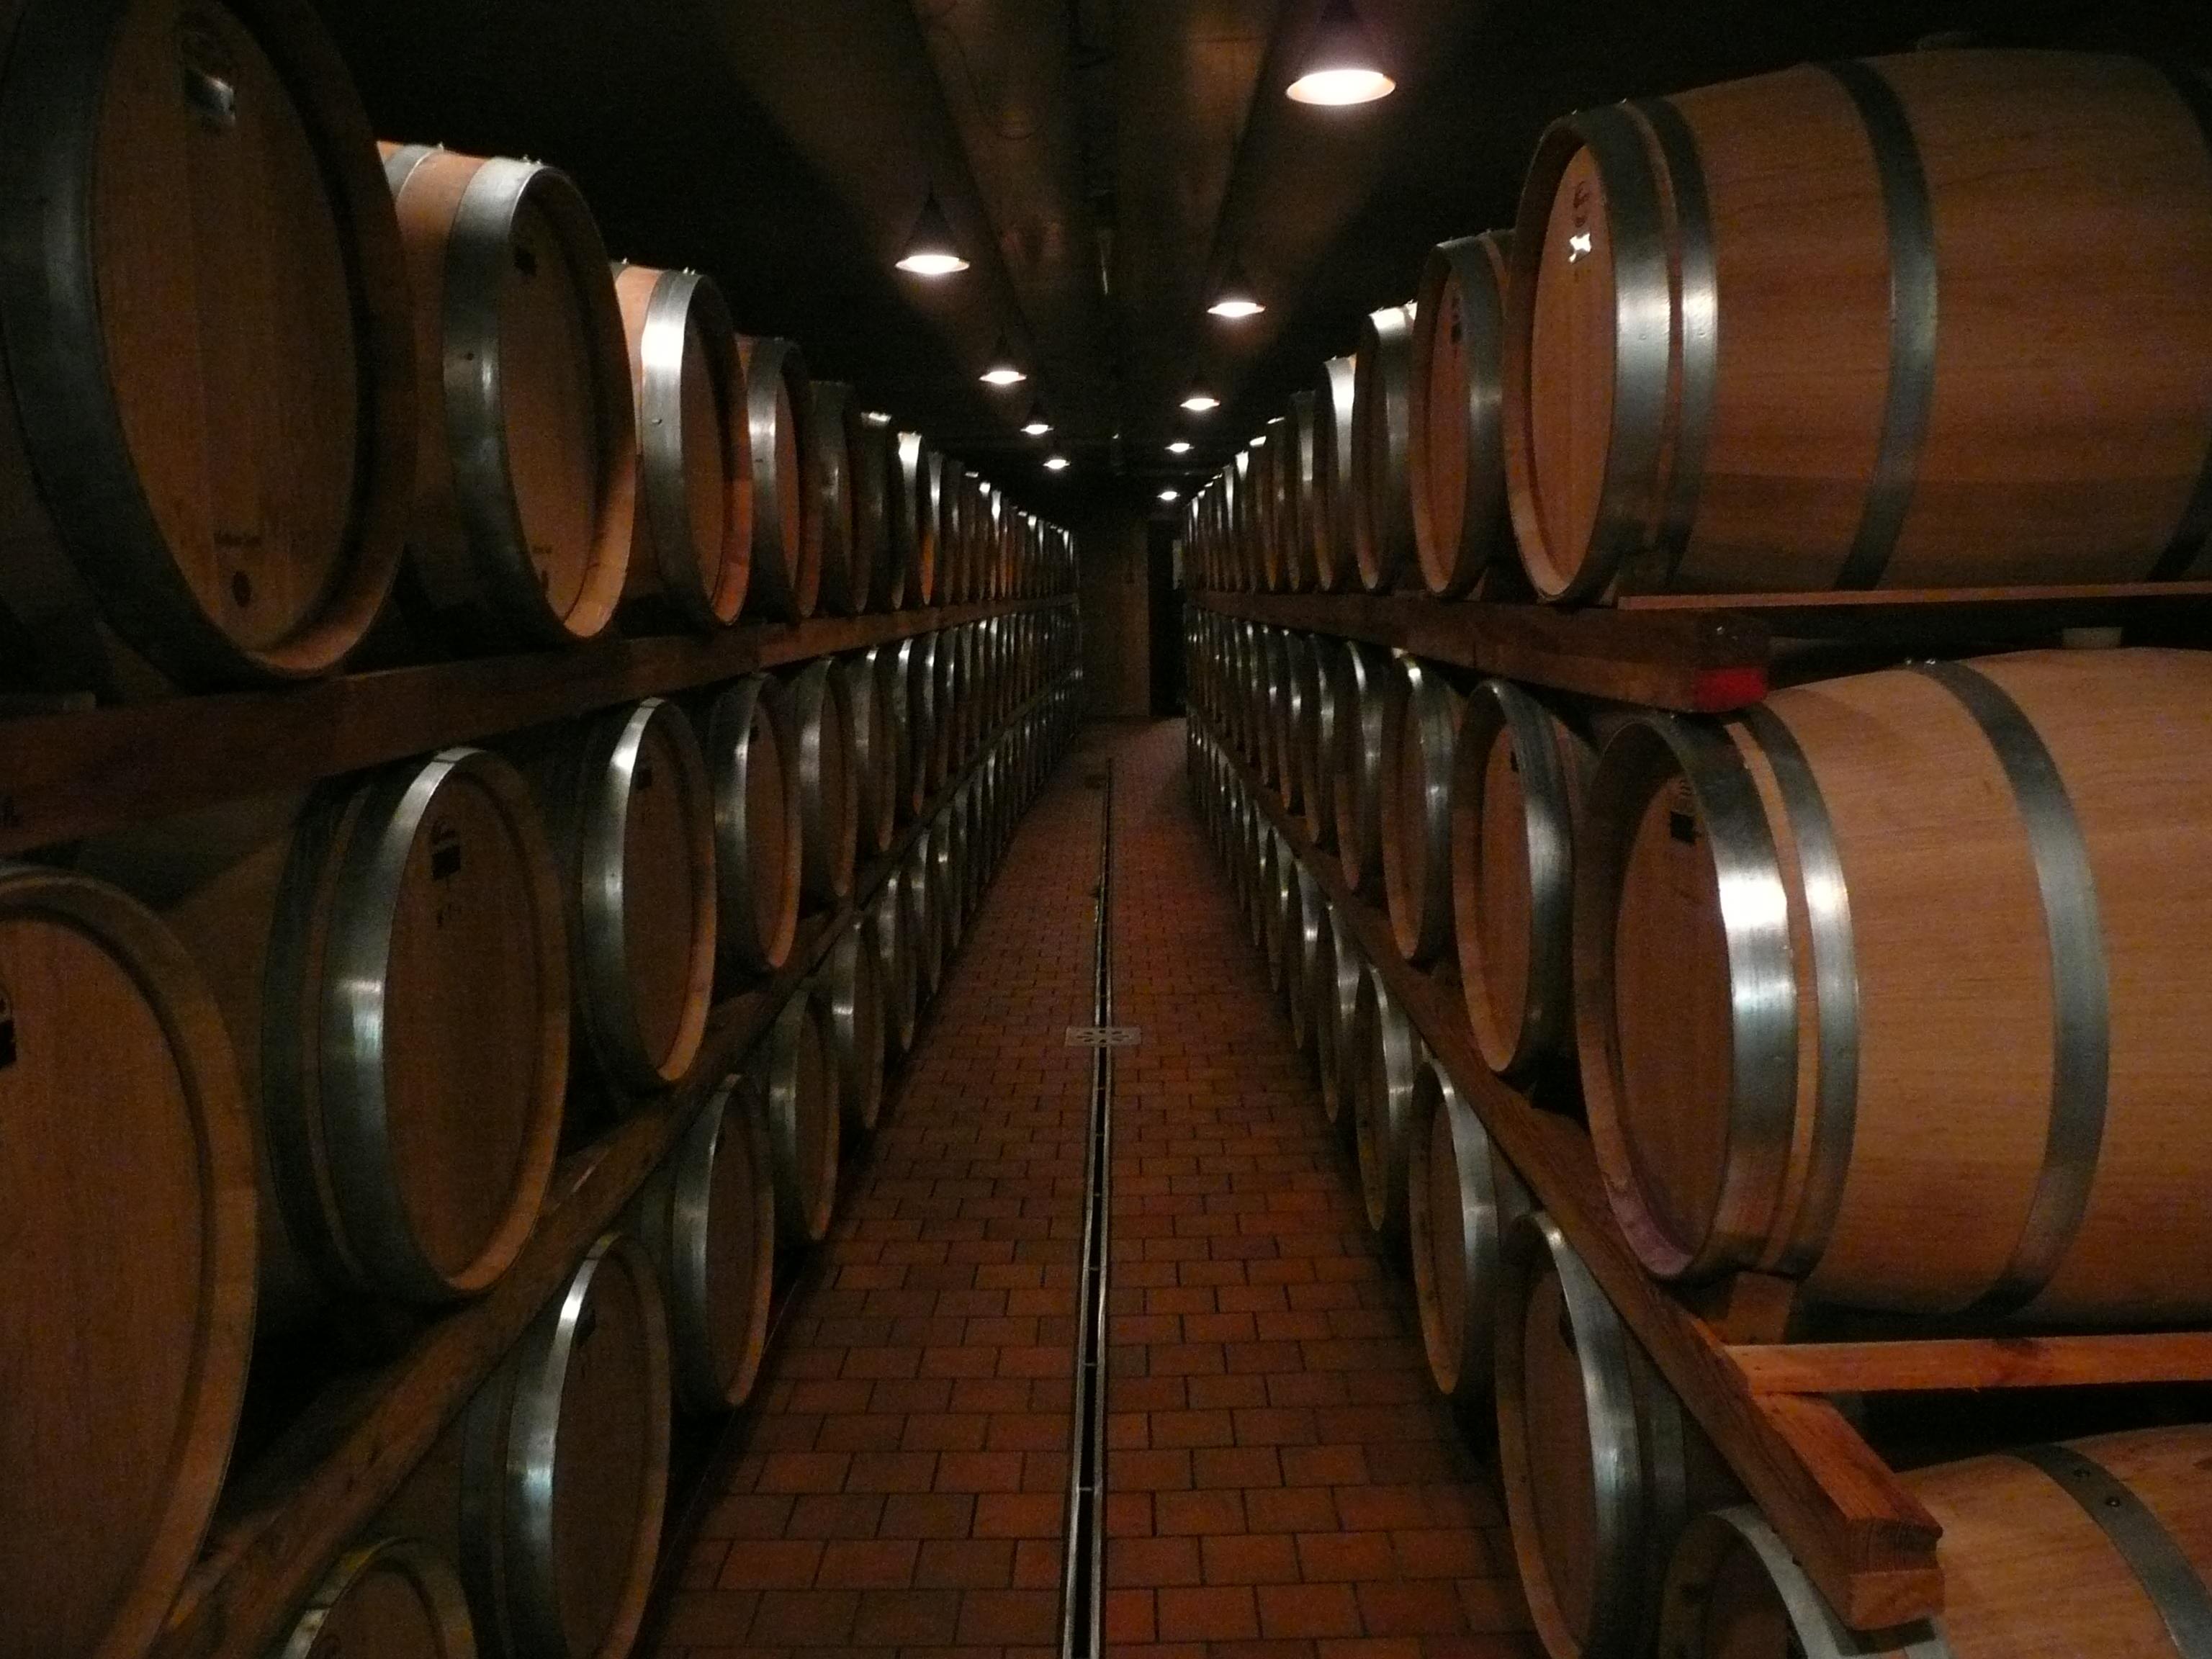 Wine Cellar Wallpaper : Wine cellar wallpaper wallpapersafari